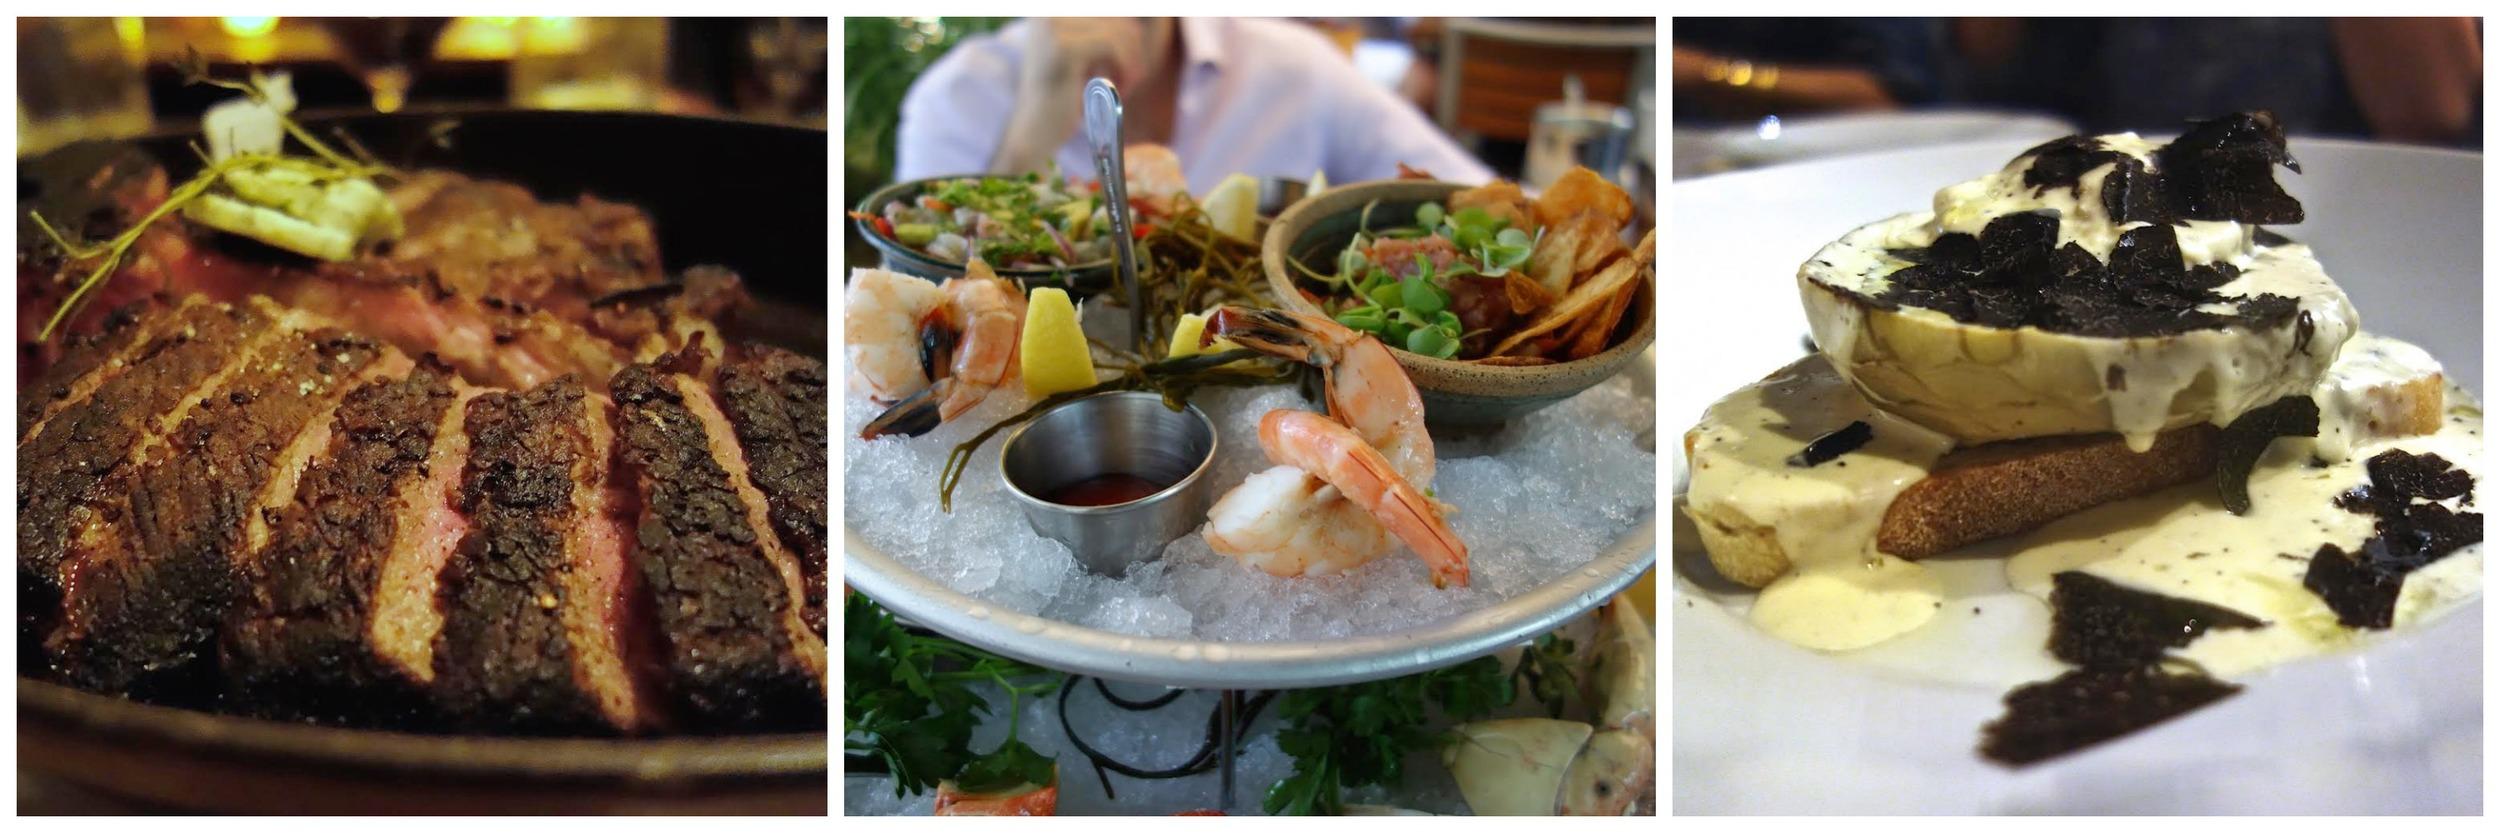 Where+to+Eat+in+Miami+Seafood+Steak+Truffles.jpeg